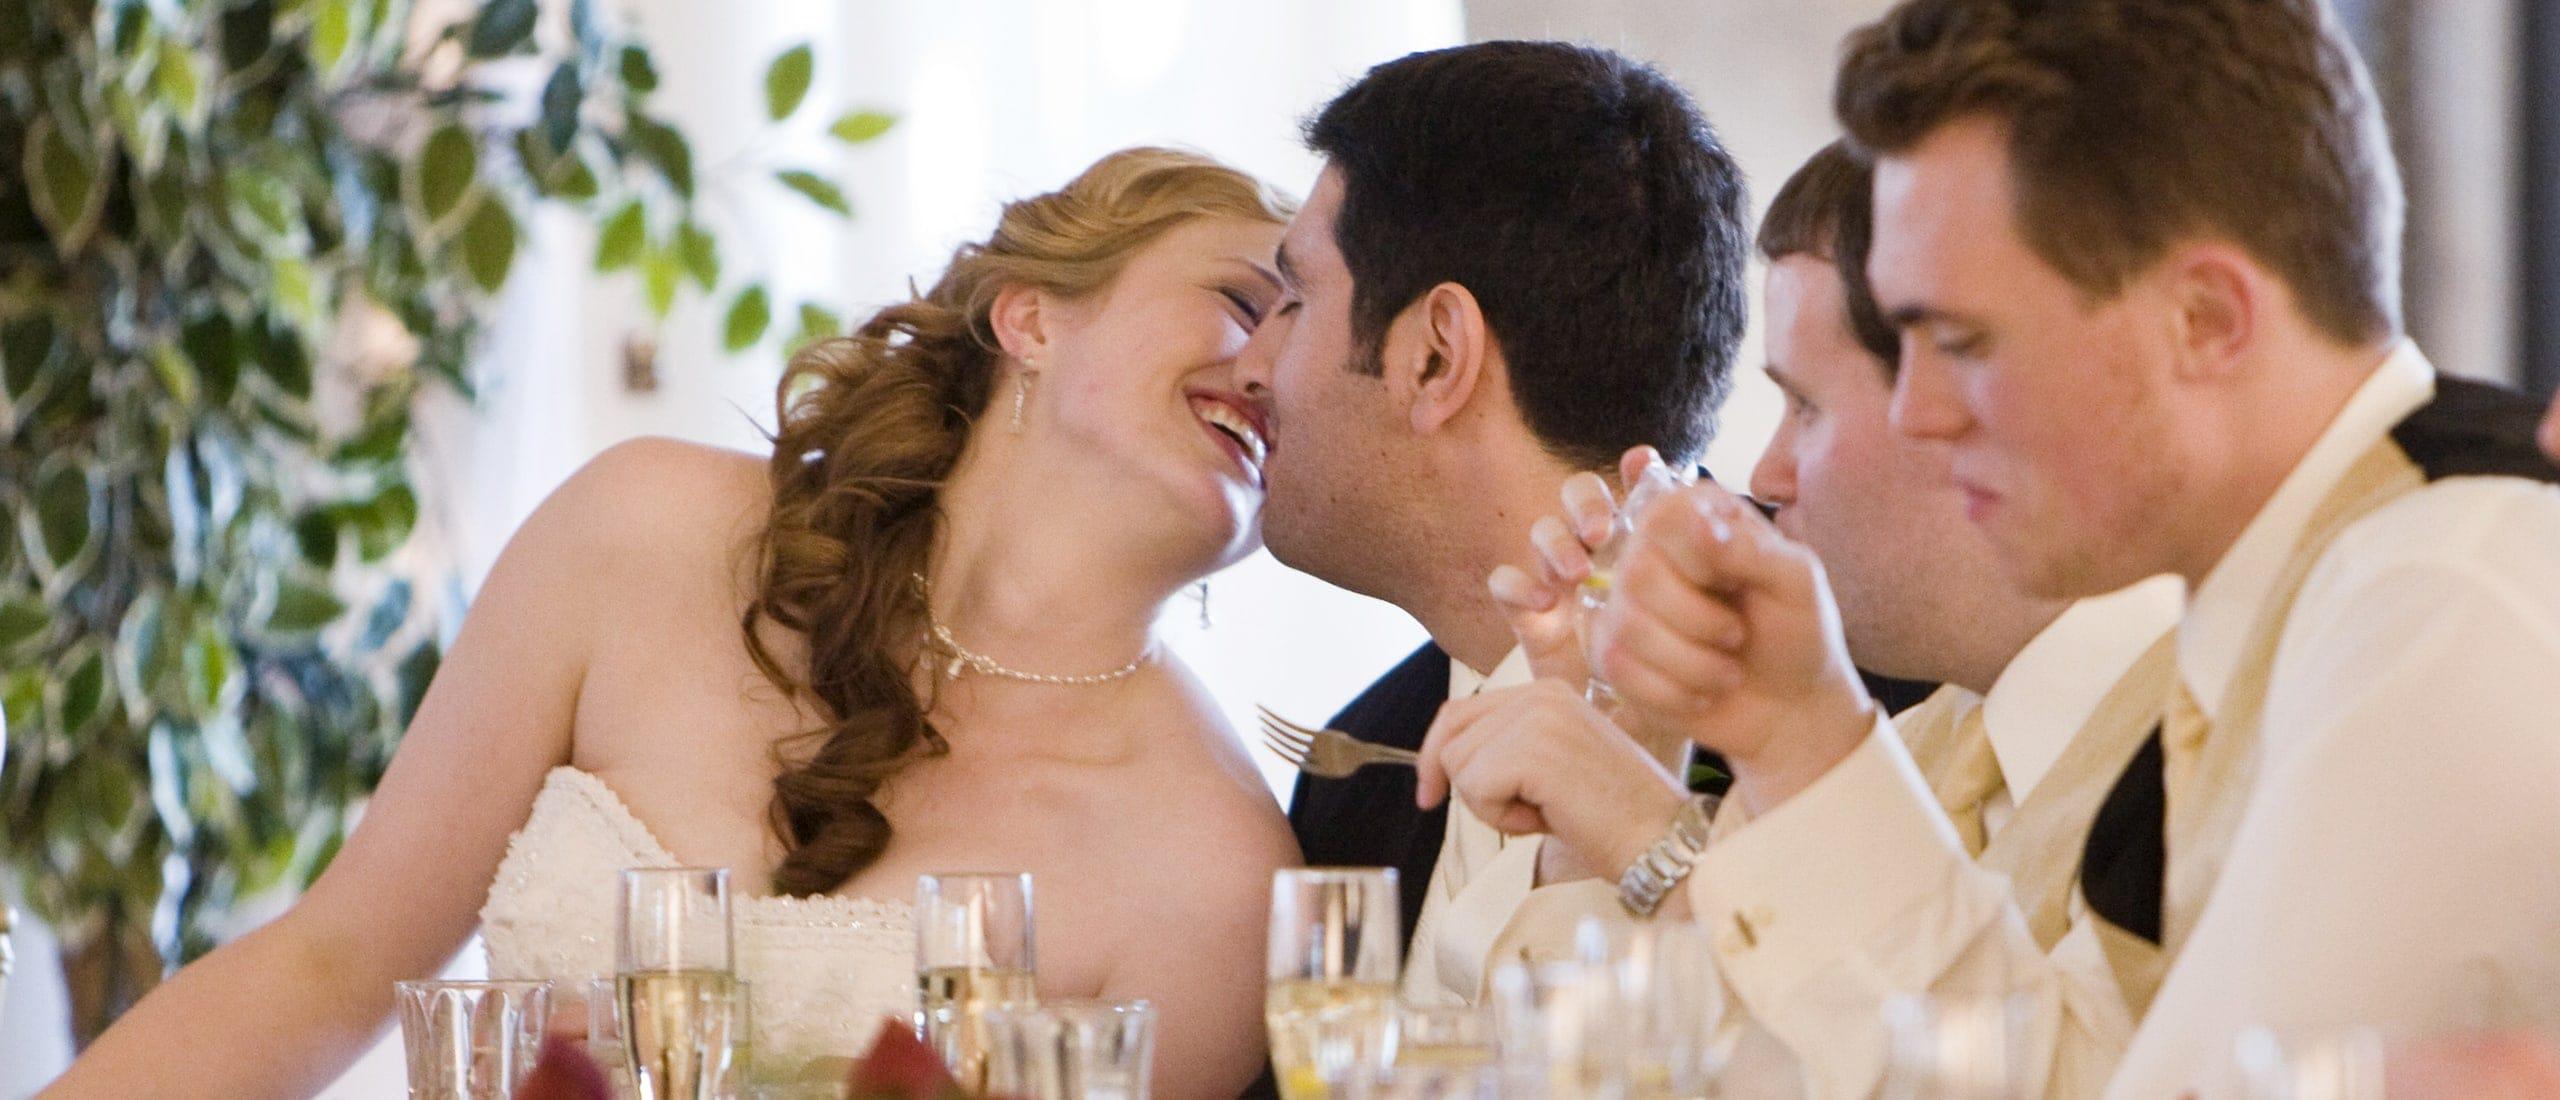 Wedding Photographers Milwaukee WI